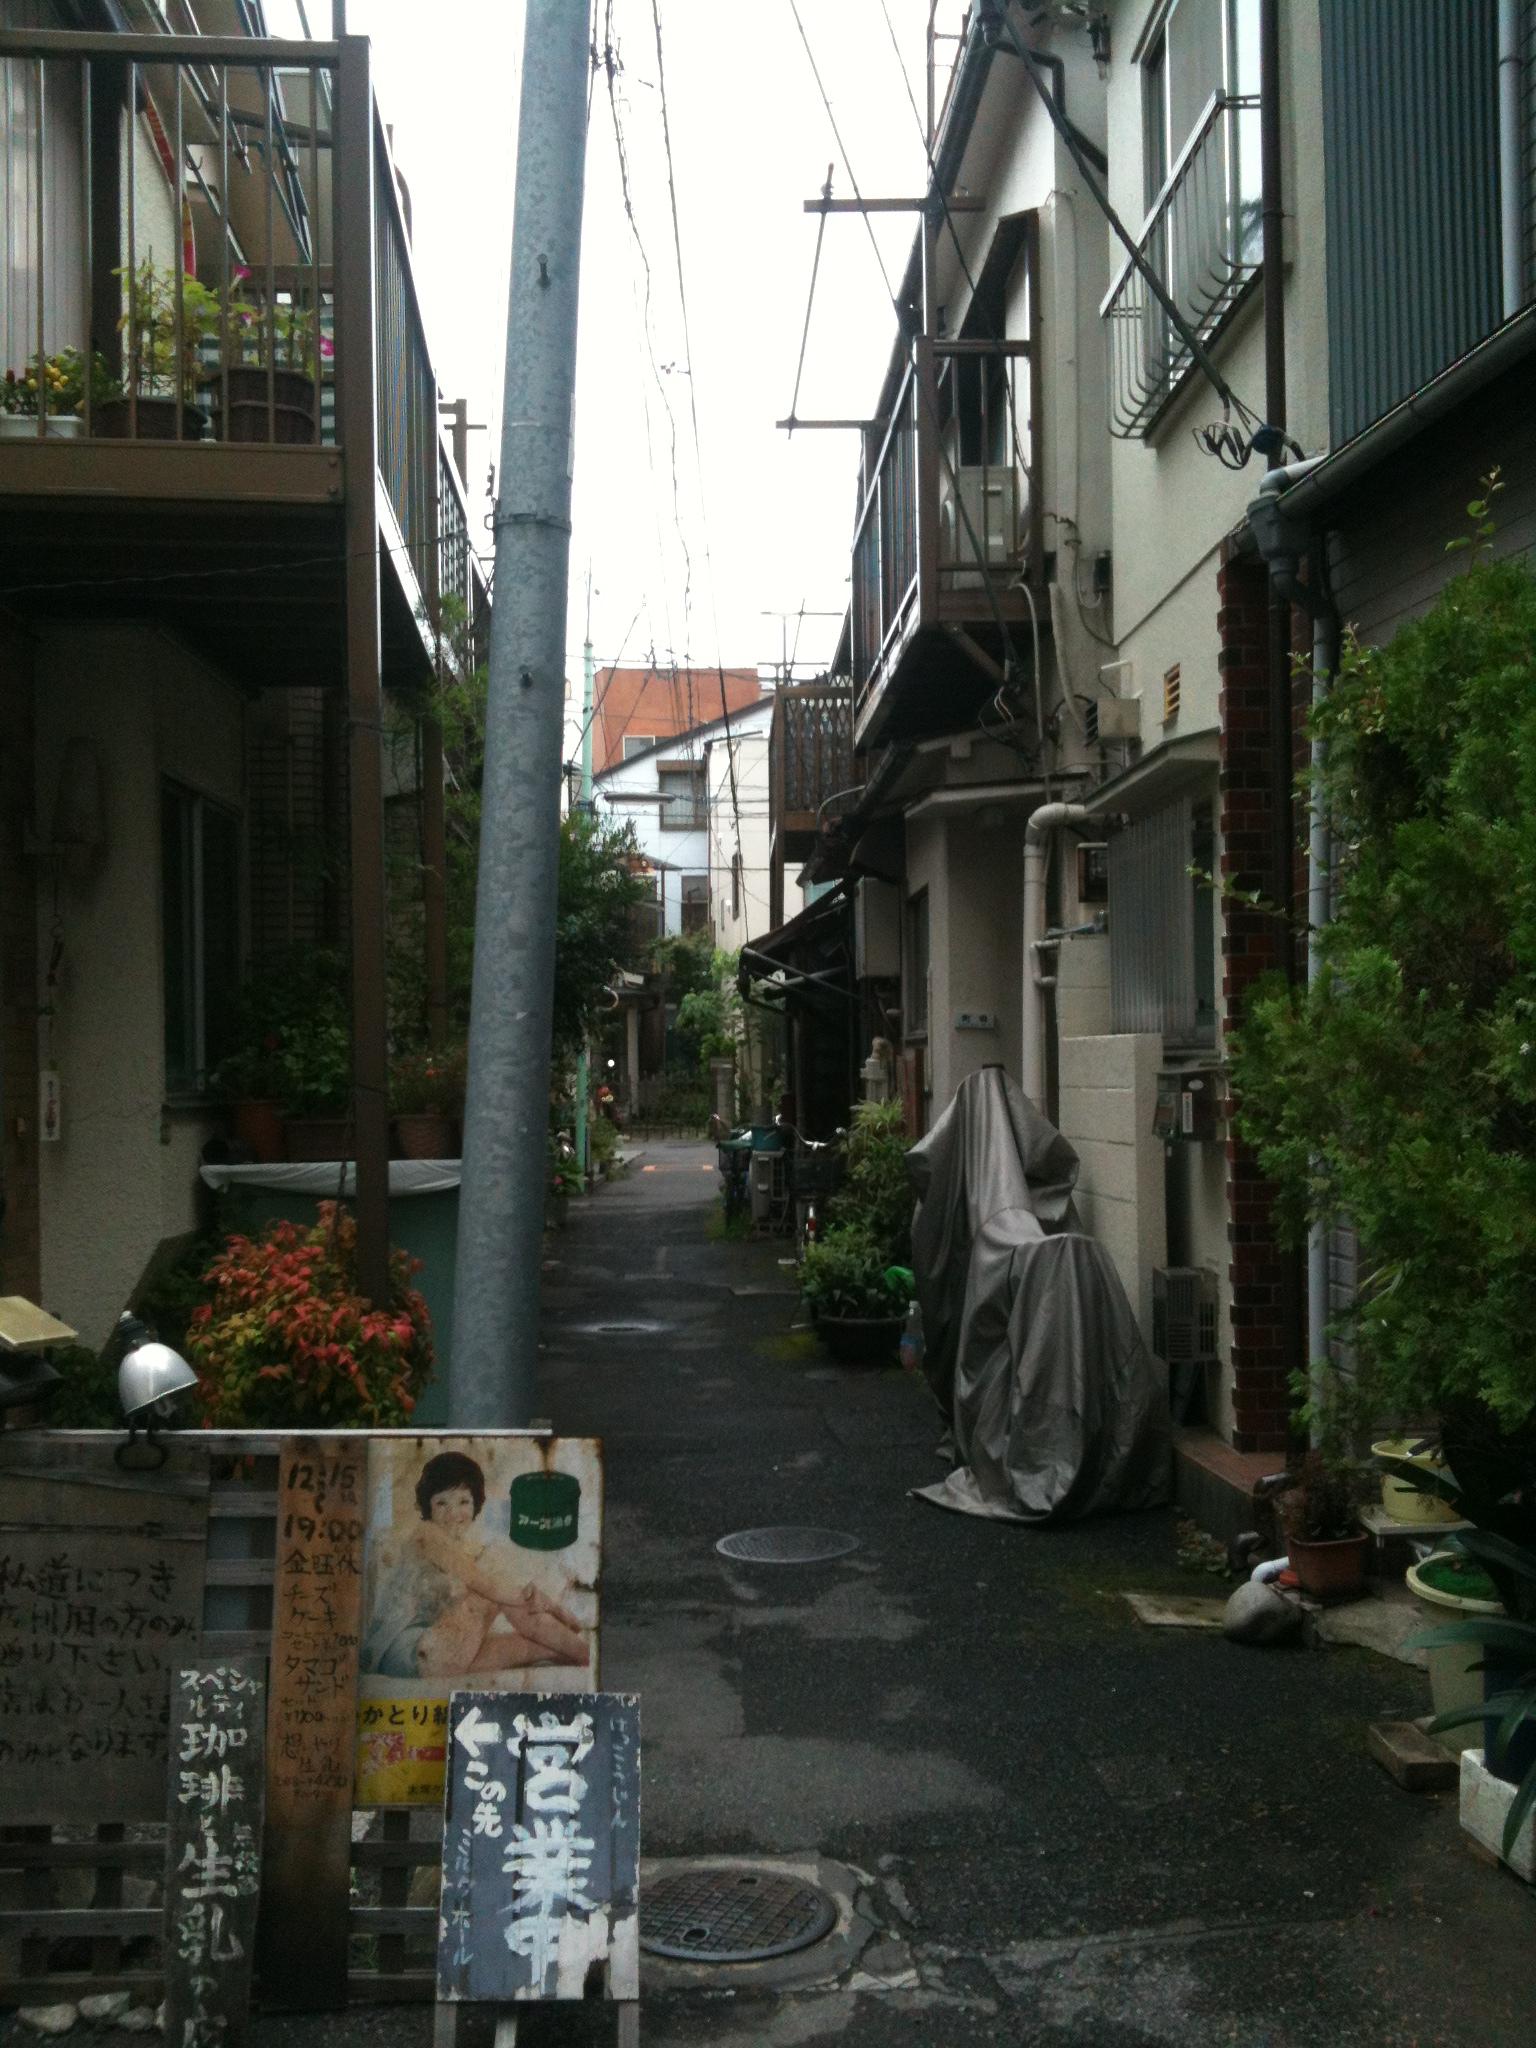 radiographie de la rue japonaise 1 2 pop up urbain. Black Bedroom Furniture Sets. Home Design Ideas